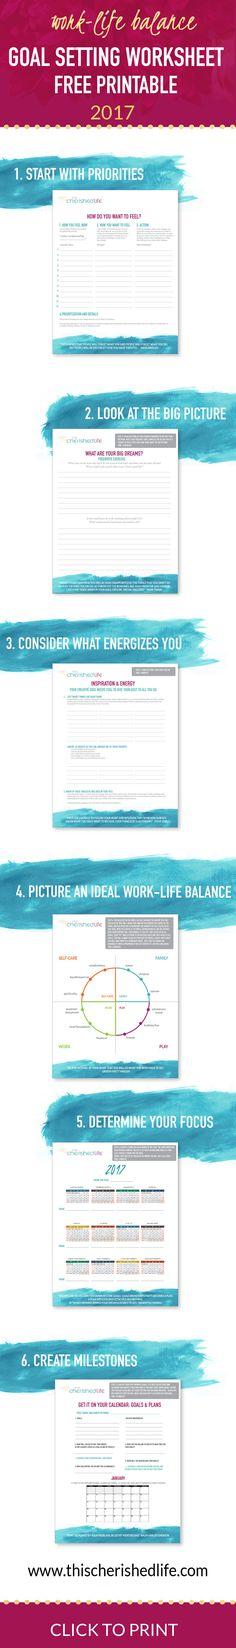 FREE 2017 goal setting printable worksheet - Set goals that matter for work life balance especially for busy moms setting goals, goal setting #goals #motivation